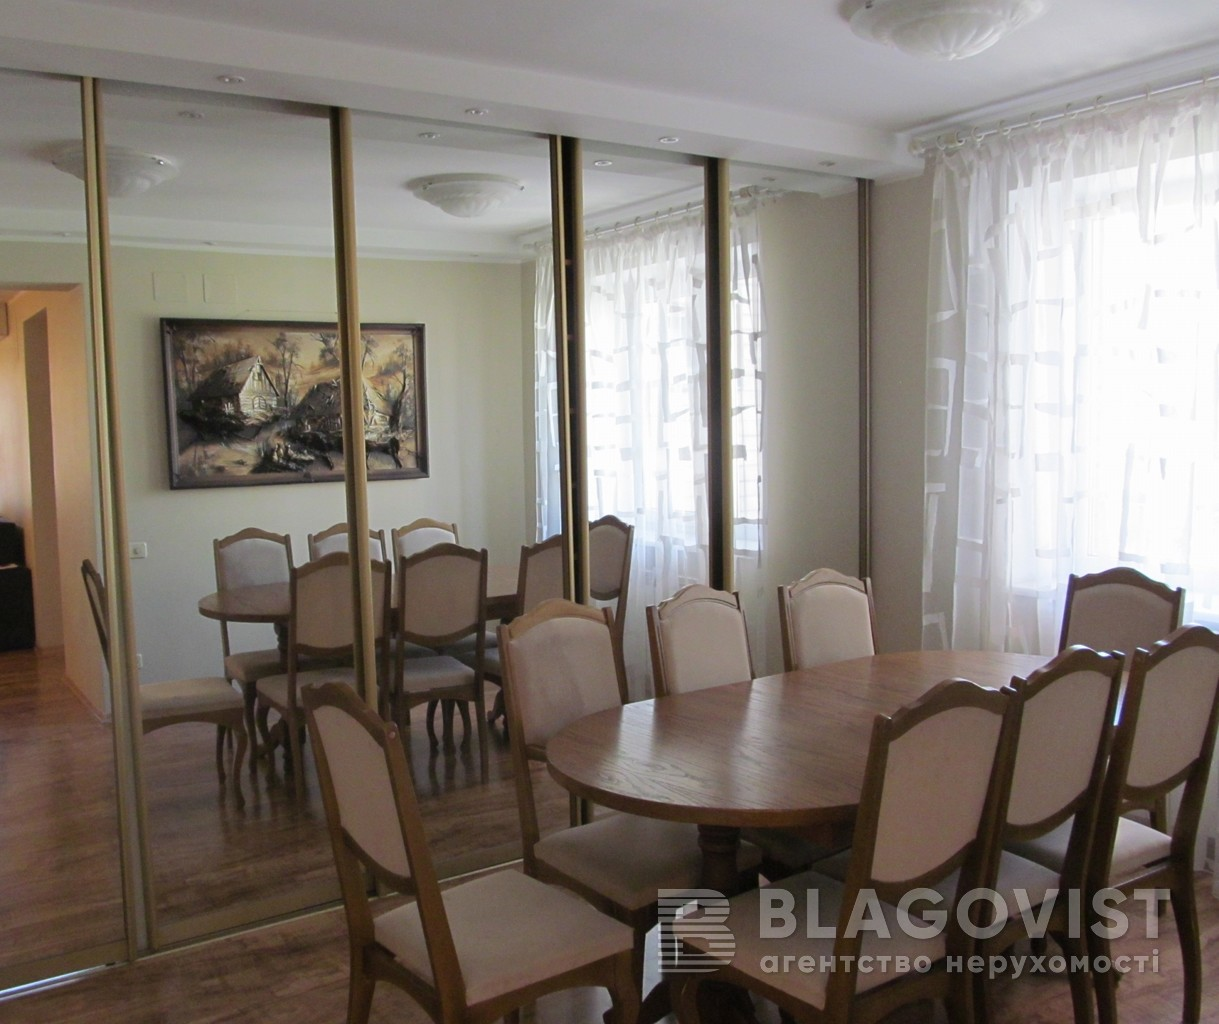 Квартира A-103899, Антоновича (Горького), 100, Киев - Фото 6